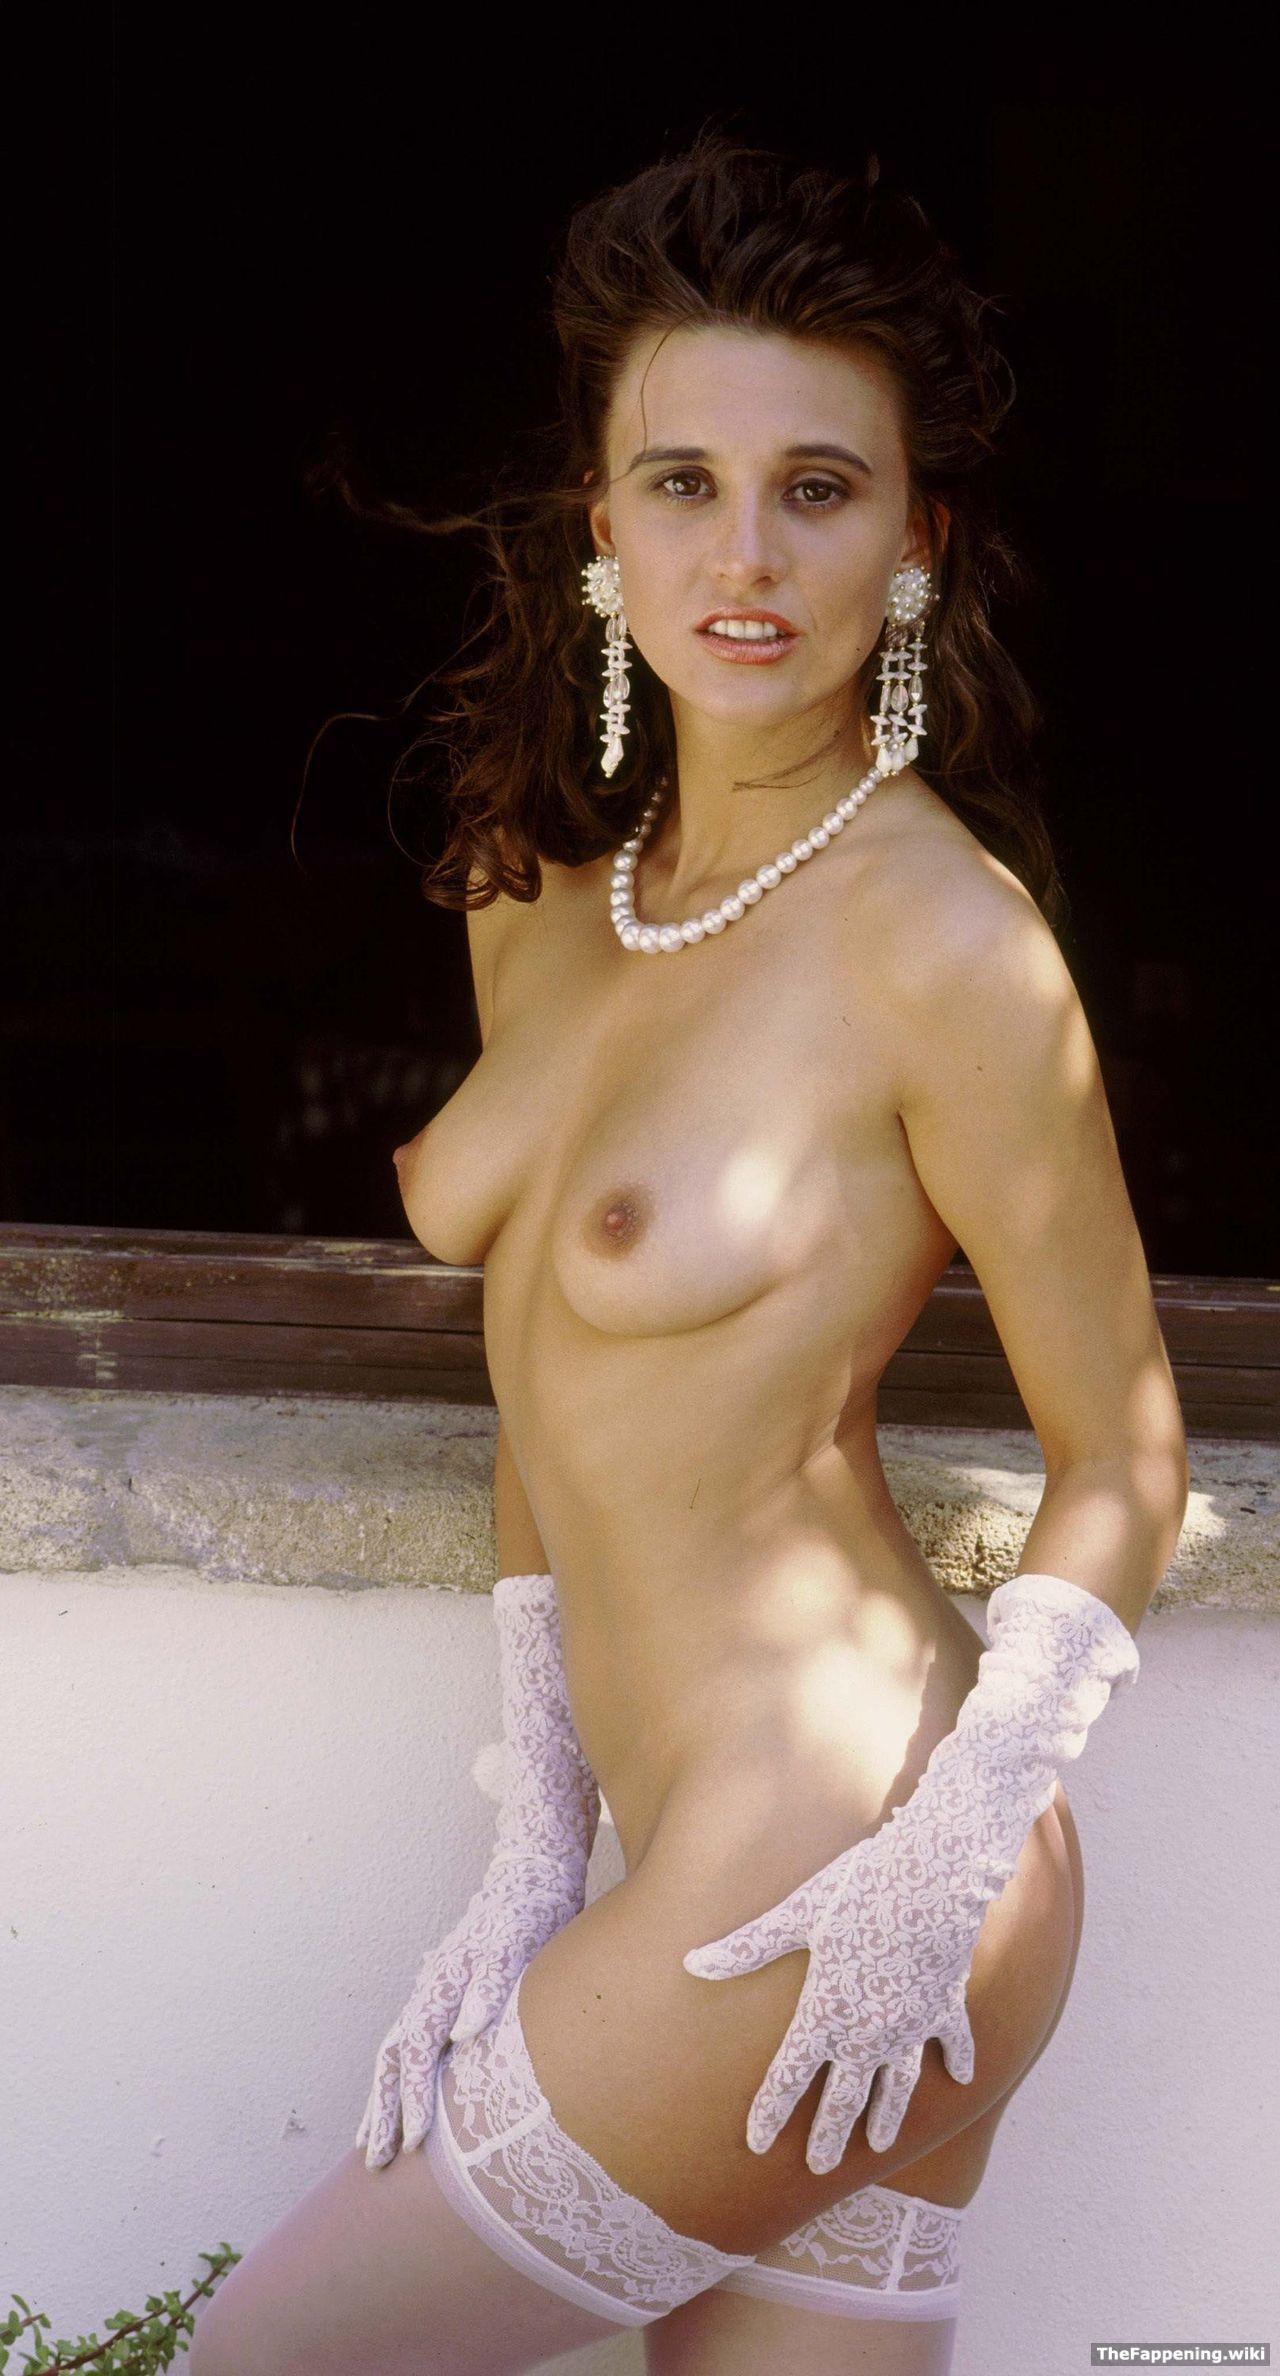 Jayne Naked jayne middlemiss nude pics & vids - the fappening